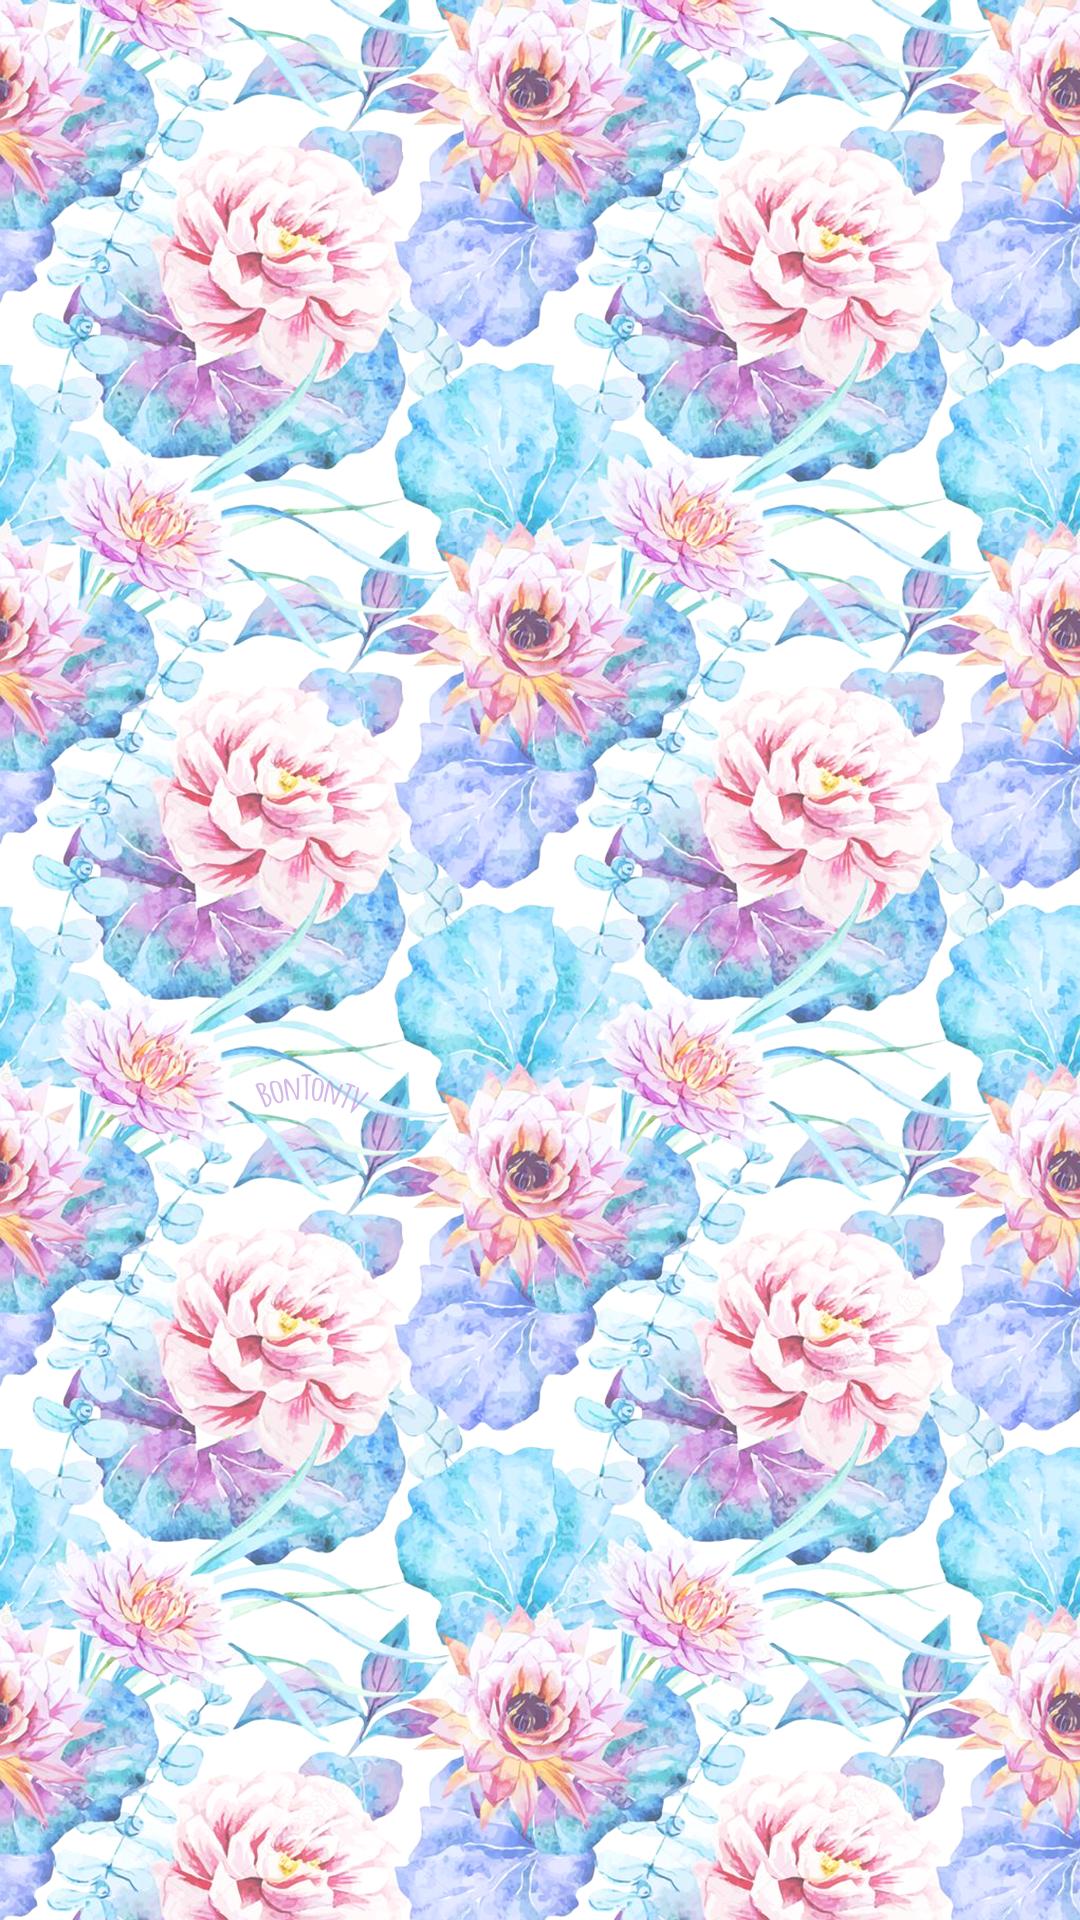 Phone Wallpapers Hd By Bonton Tv Free Download 1080x1920 Iphone Wallpapers An Flower Phone Wallpaper Artsy Wallpaper Iphone Love Wallpaper Backgrounds